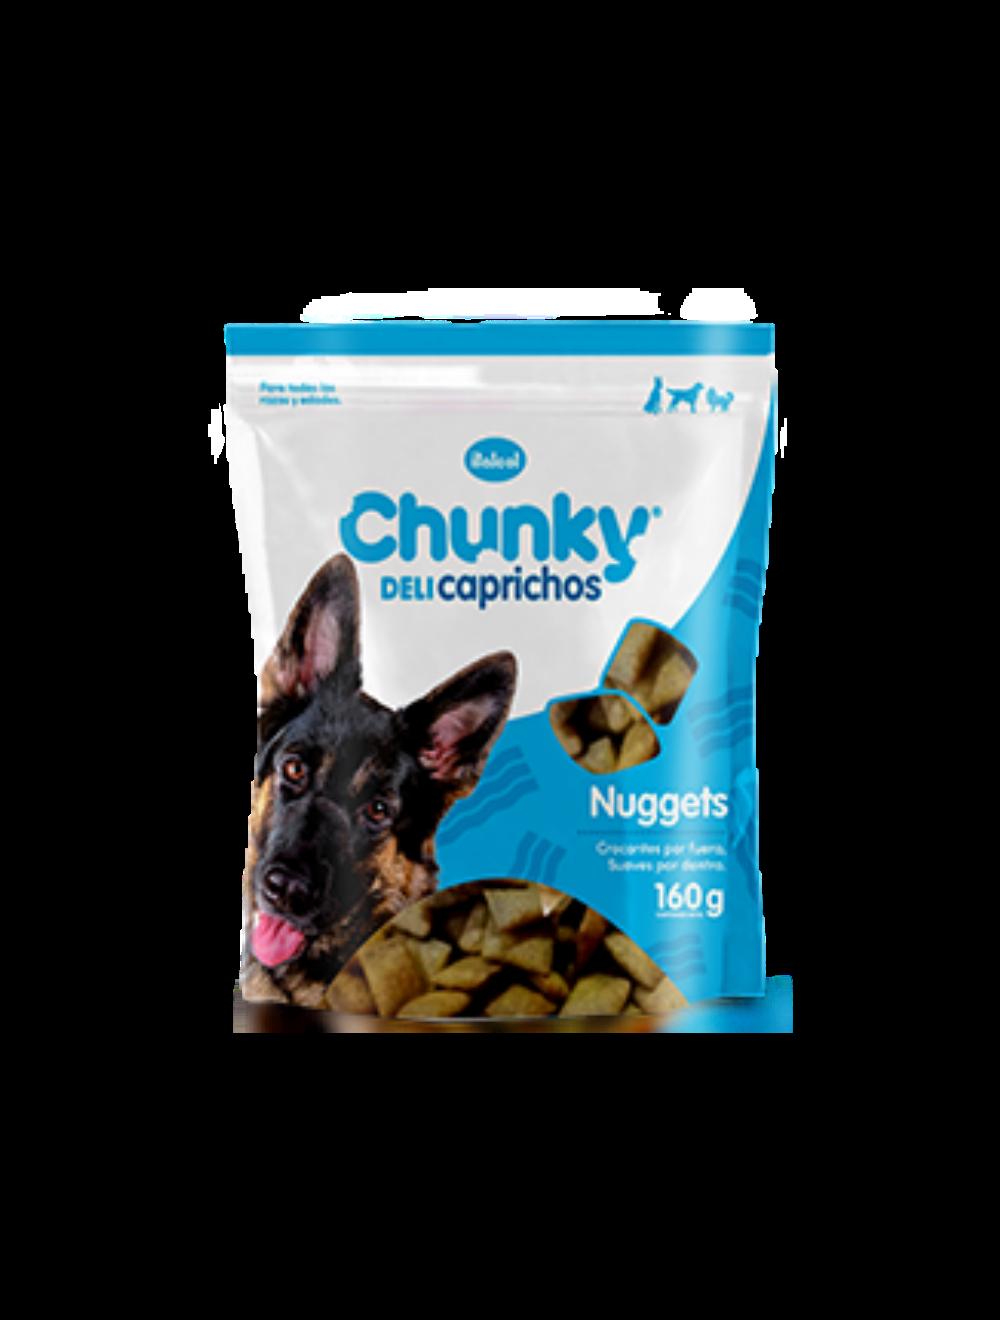 Snacks Chunky Delicaprichos Rellenos de tocineta 160 gr